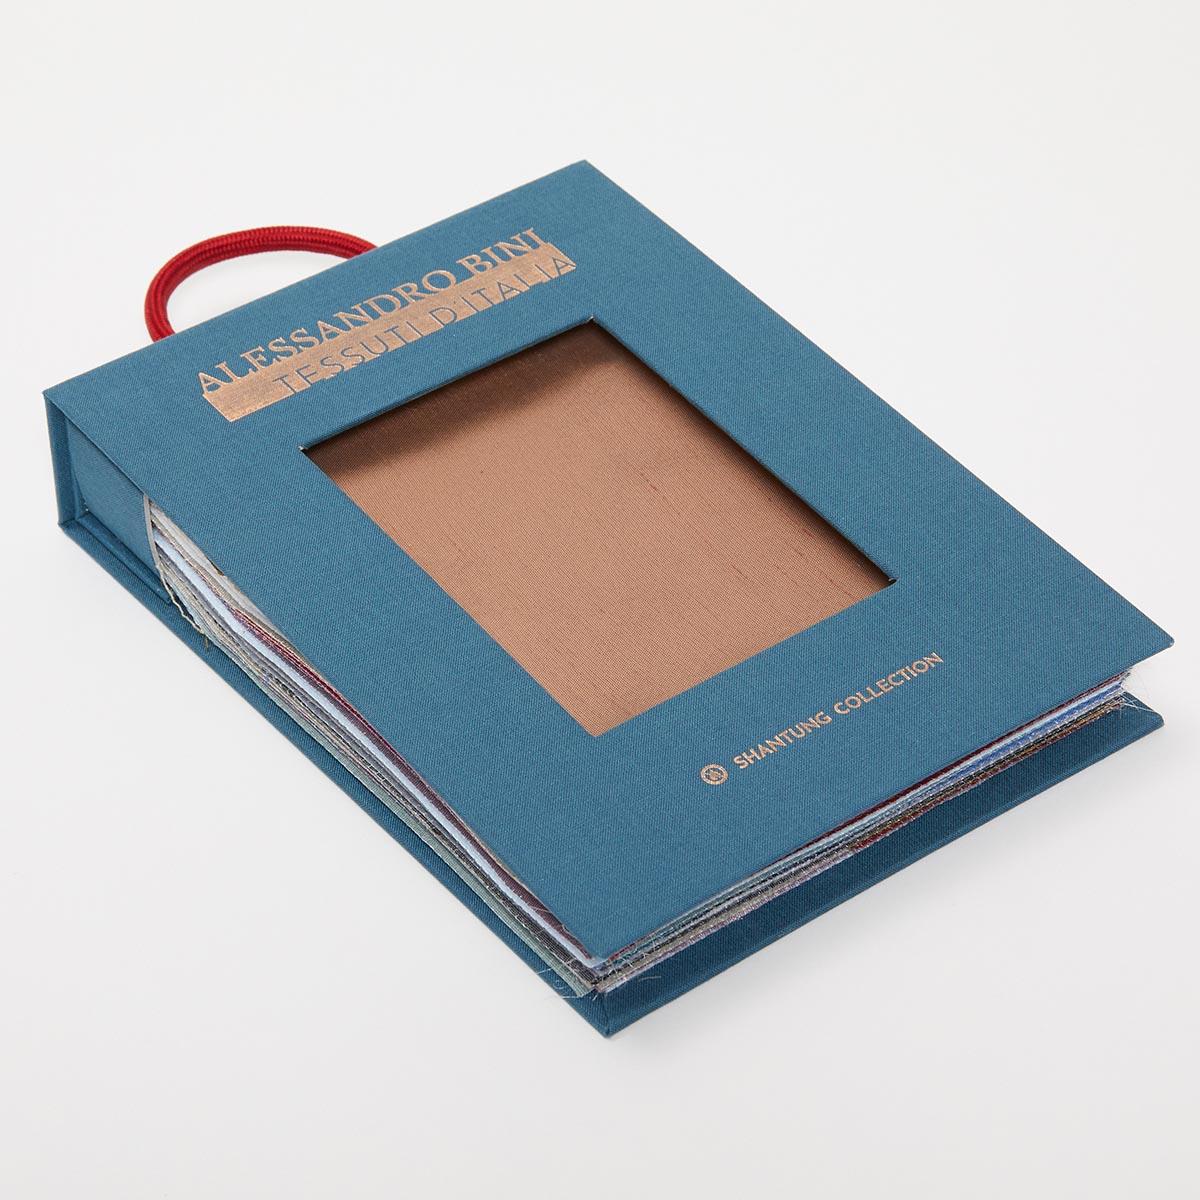 Sample Shantung Collection – Mazza